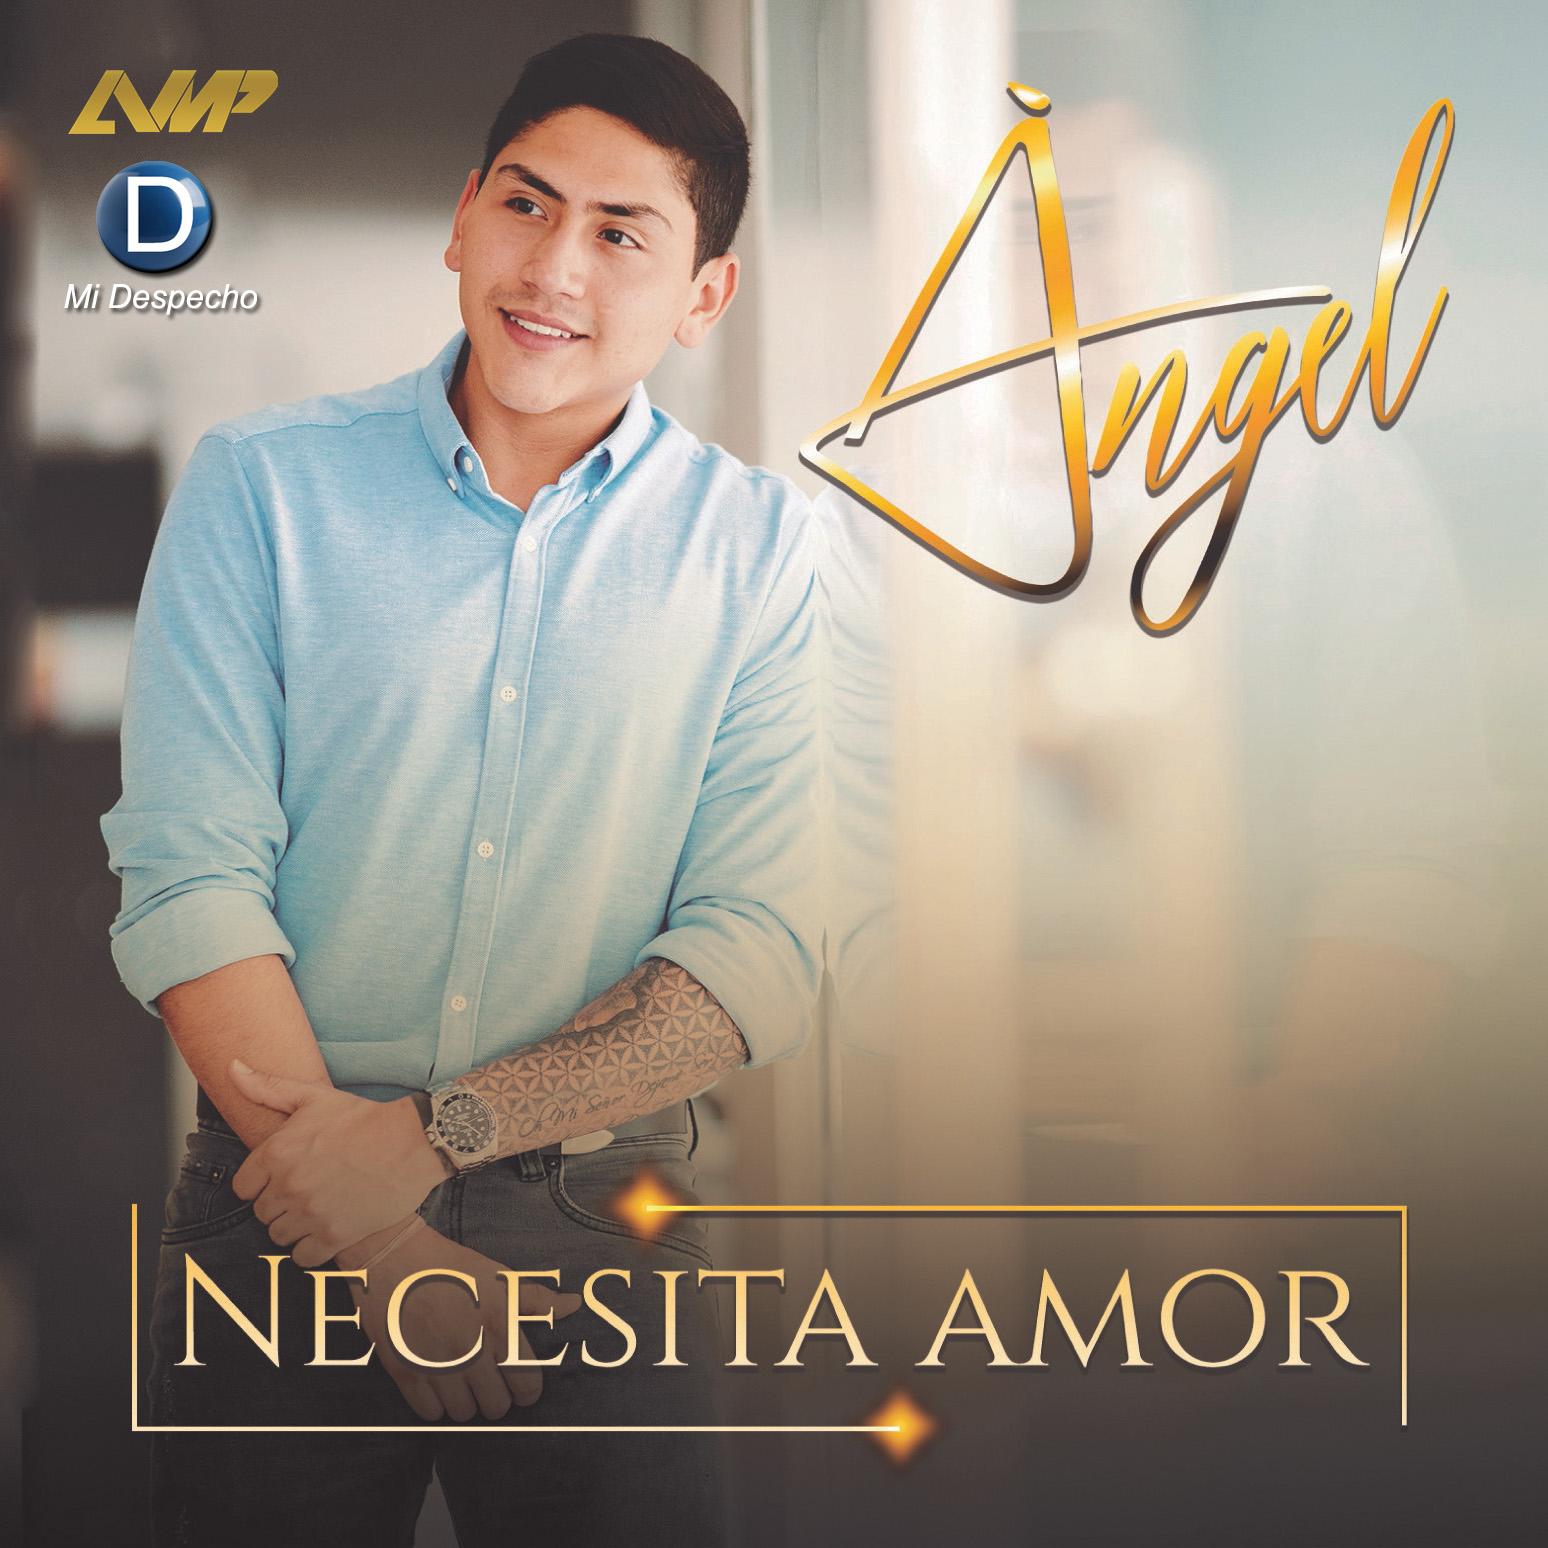 Angel Necesita Amor Frontal